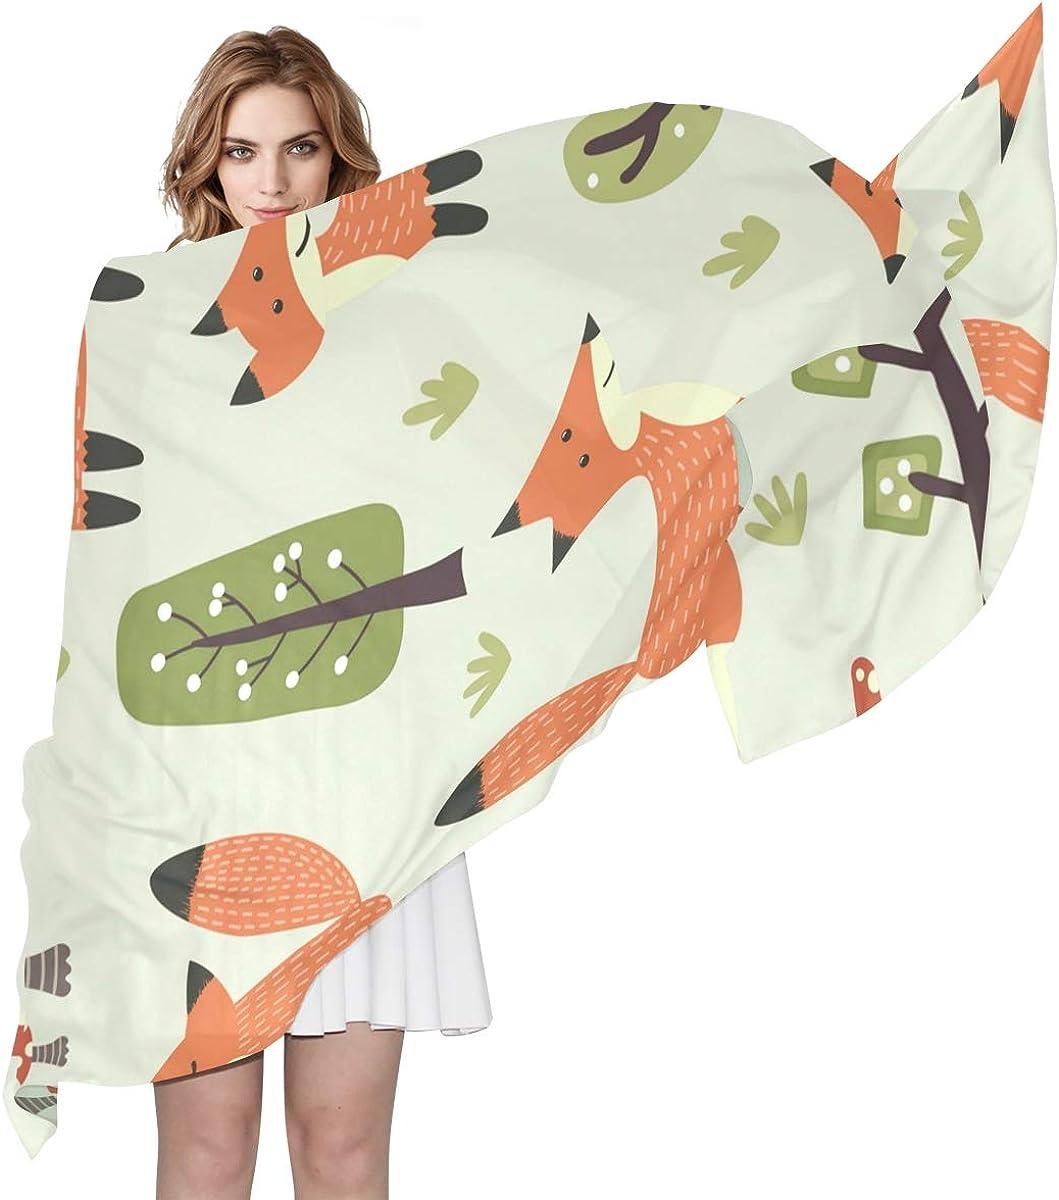 XLING Fashion Scarf Cute Animal Fox Tree Leaves Long Lightweight Sunscreen Scarf Shawl Wrap Muffler Neckerchief for Women Men